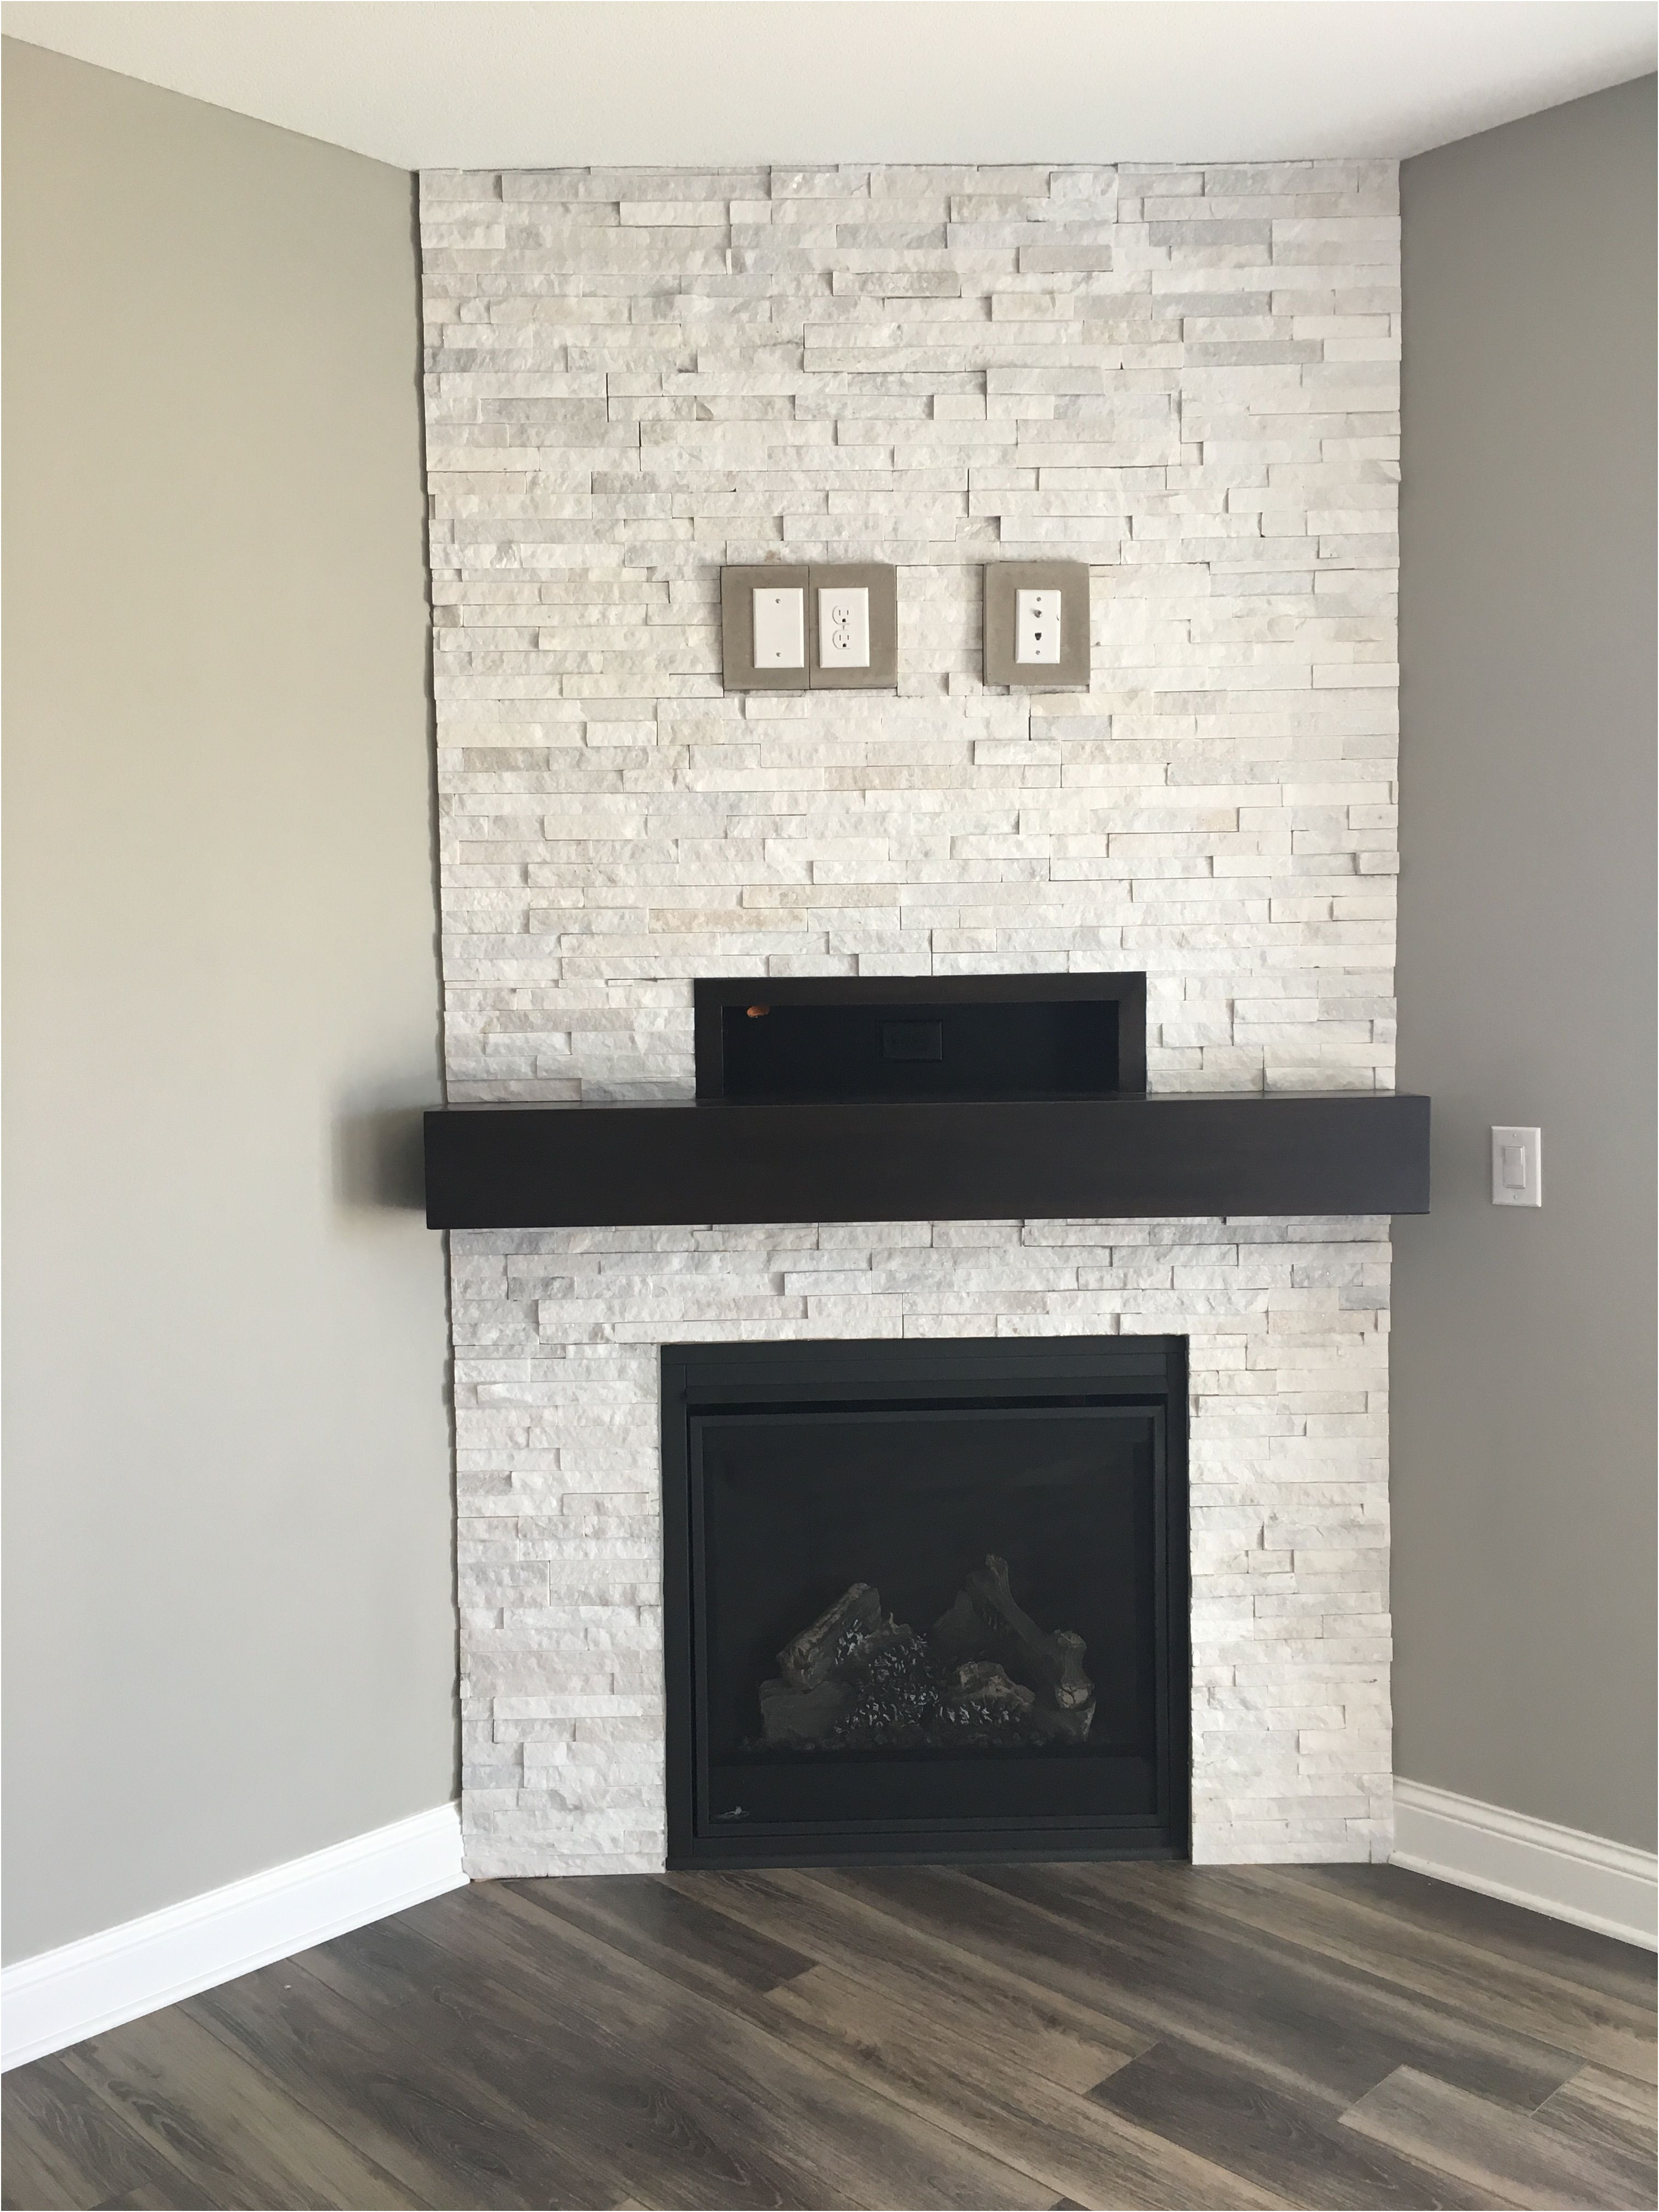 Fireplace Ideas Stone Inspirational Pin On Fireplace Ideas We Love